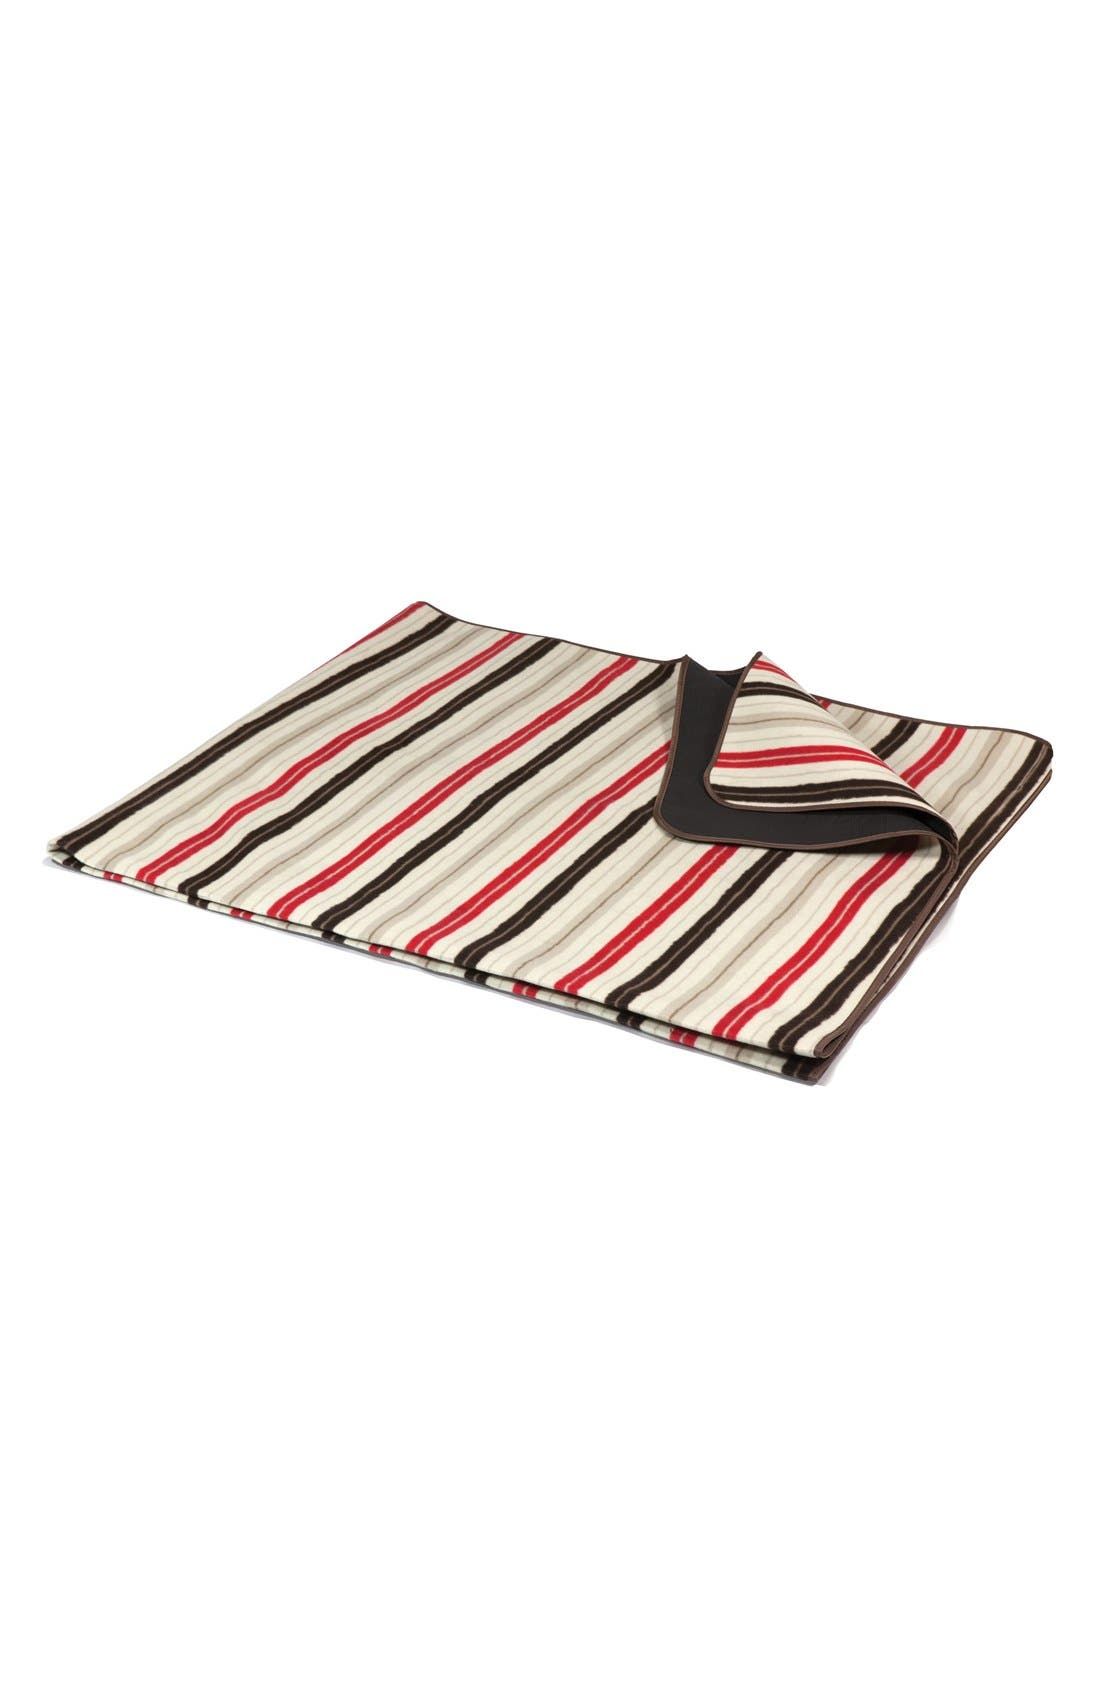 'XL' Blanket Tote,                             Main thumbnail 1, color,                             Brown